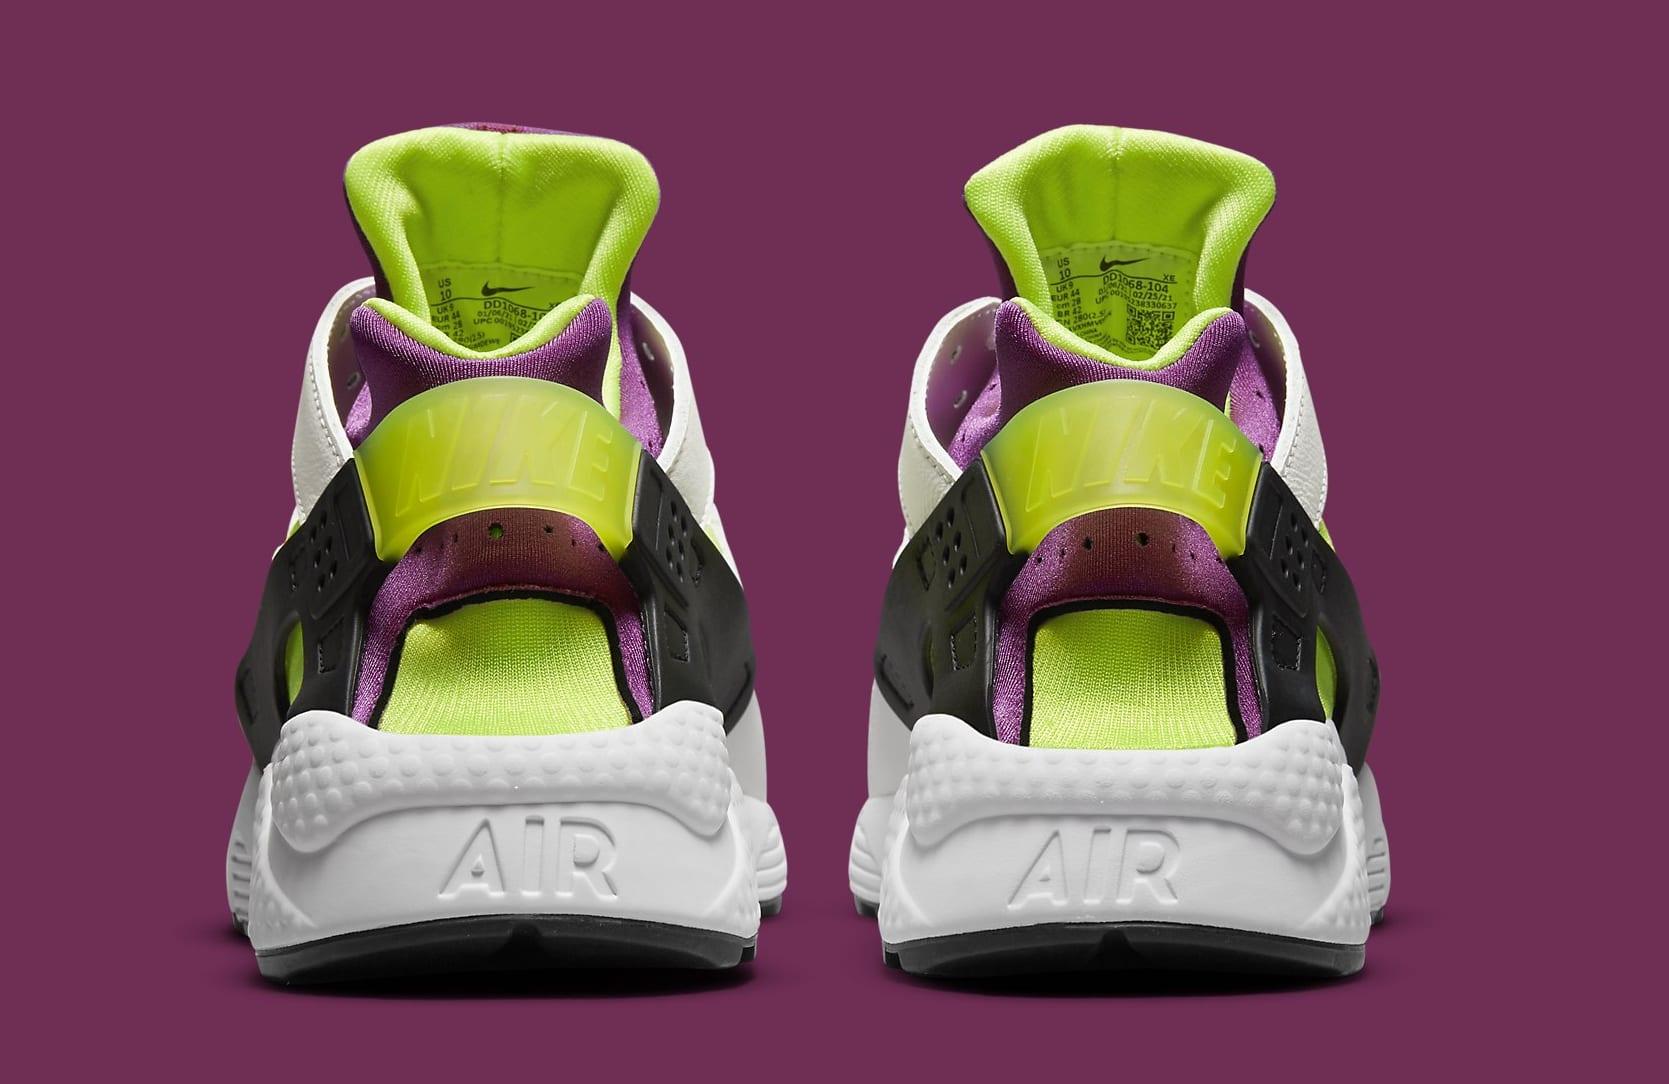 Nike Air Huarache Neon Yellow/Magenta DD1068-104 Heel